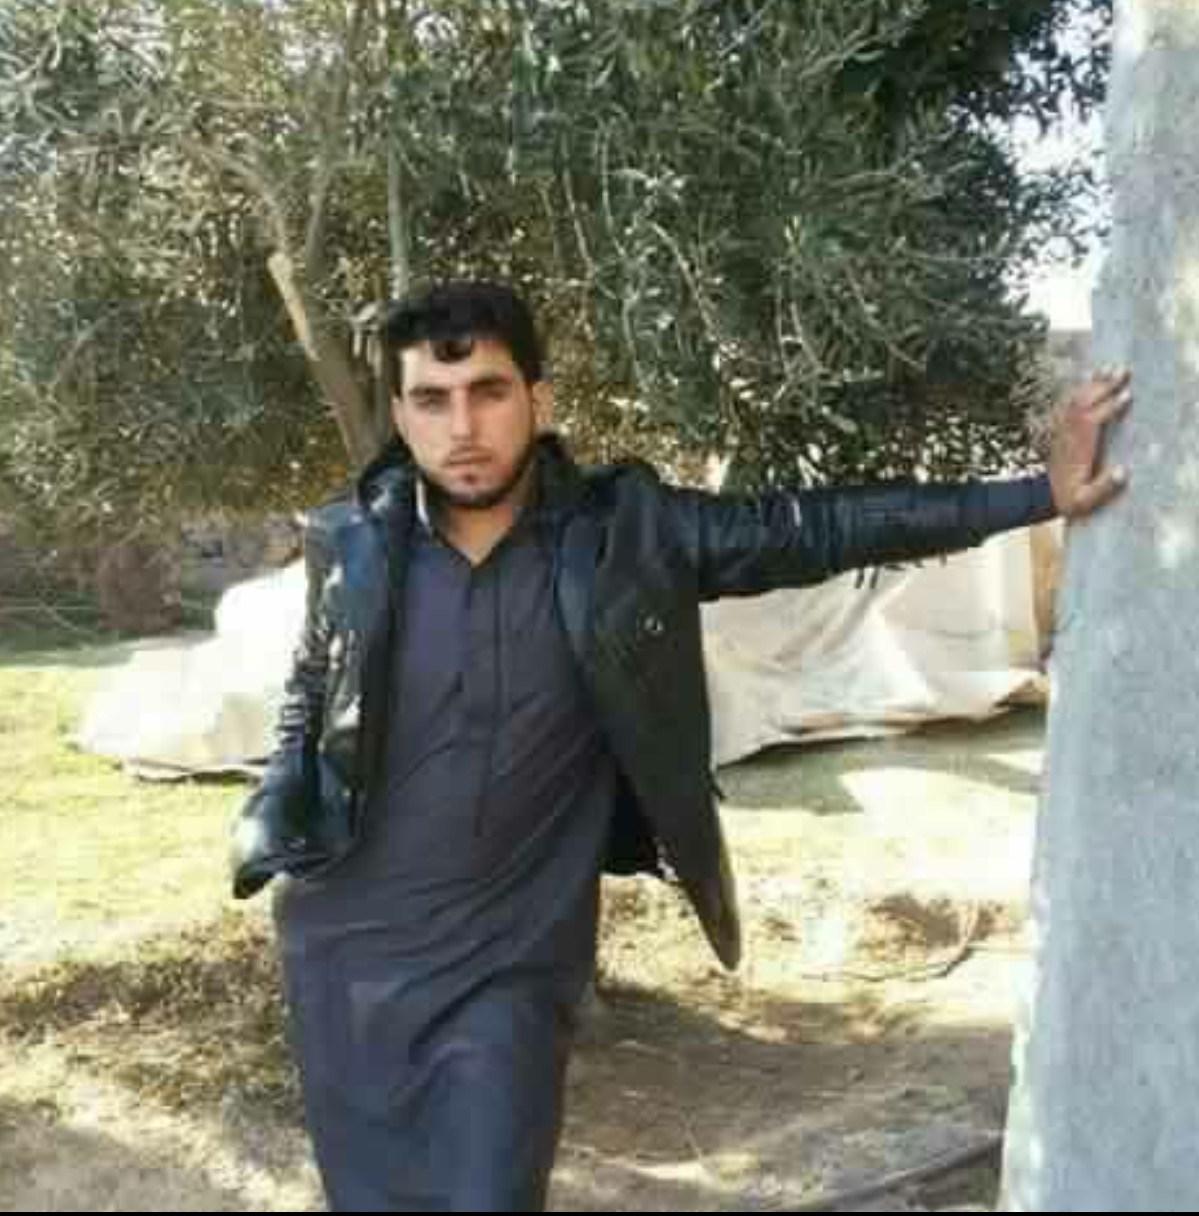 Abdallah Ahmad al Hamid or al-Hadidi (via Raqqa Post)